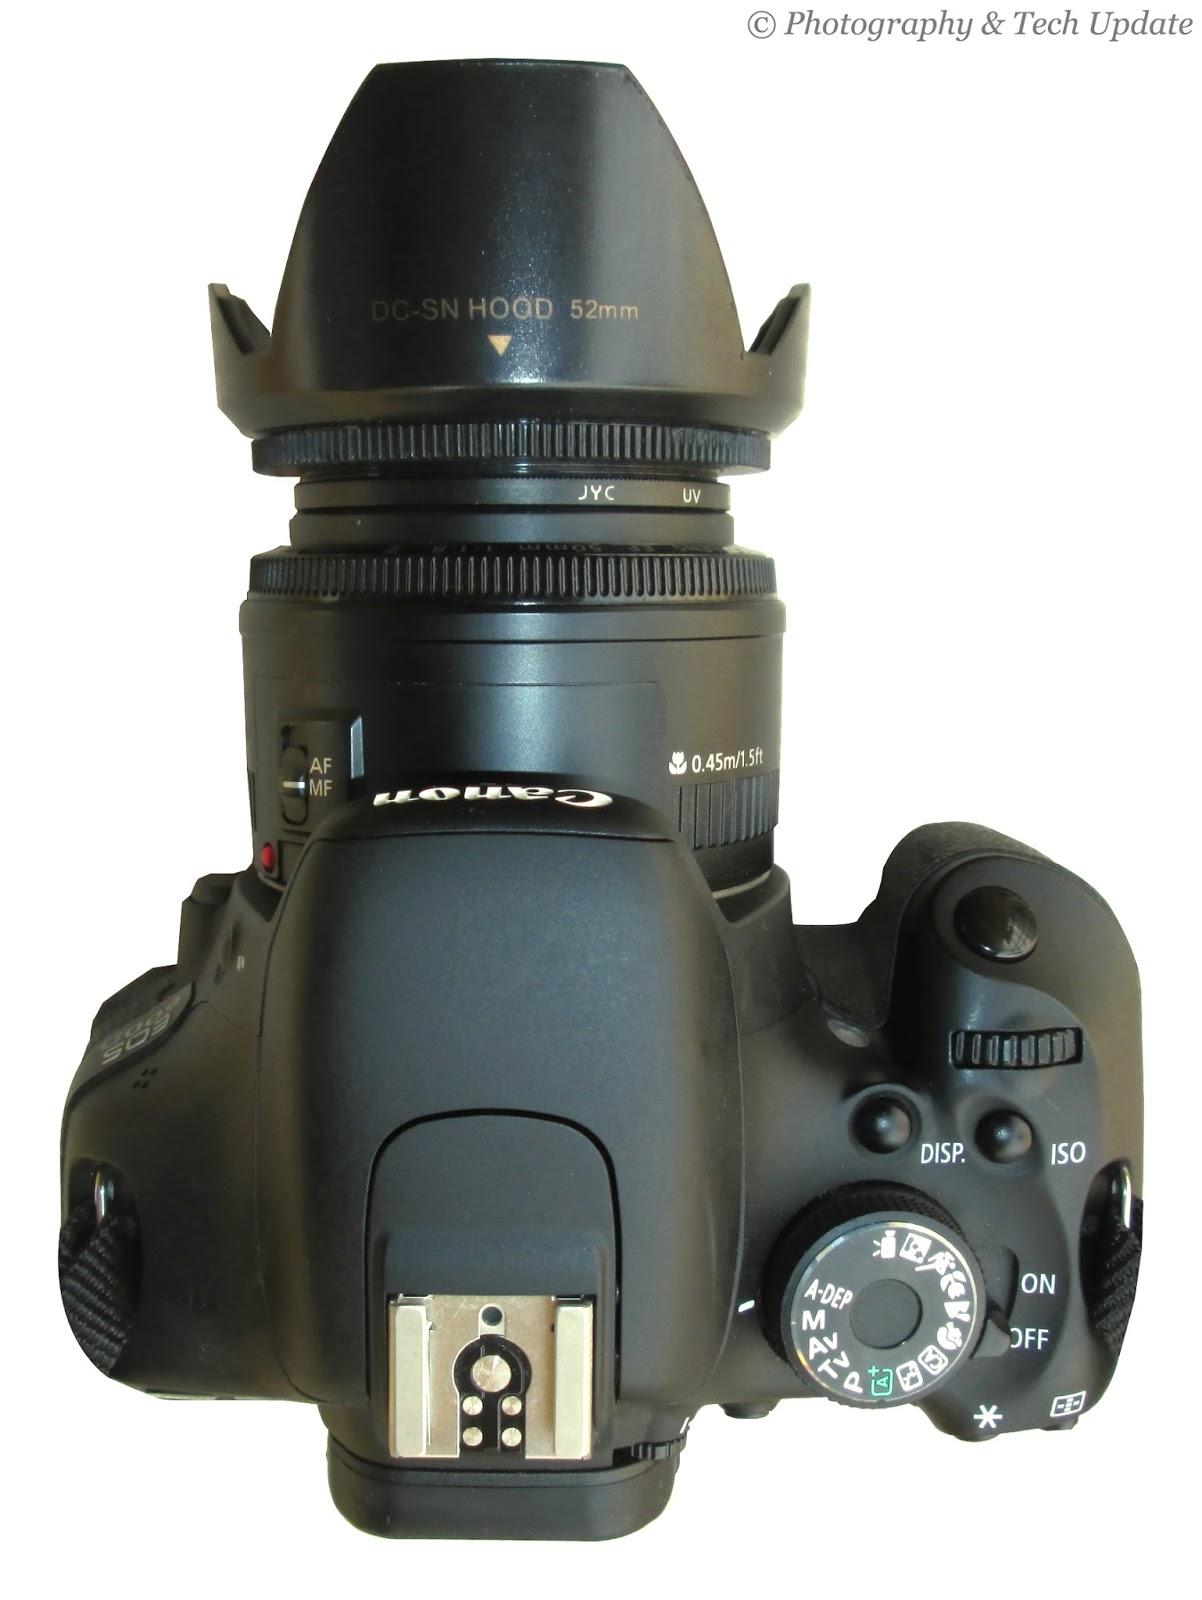 Photography & Tech Update | Trickytechtunes: Canon EOS 600D